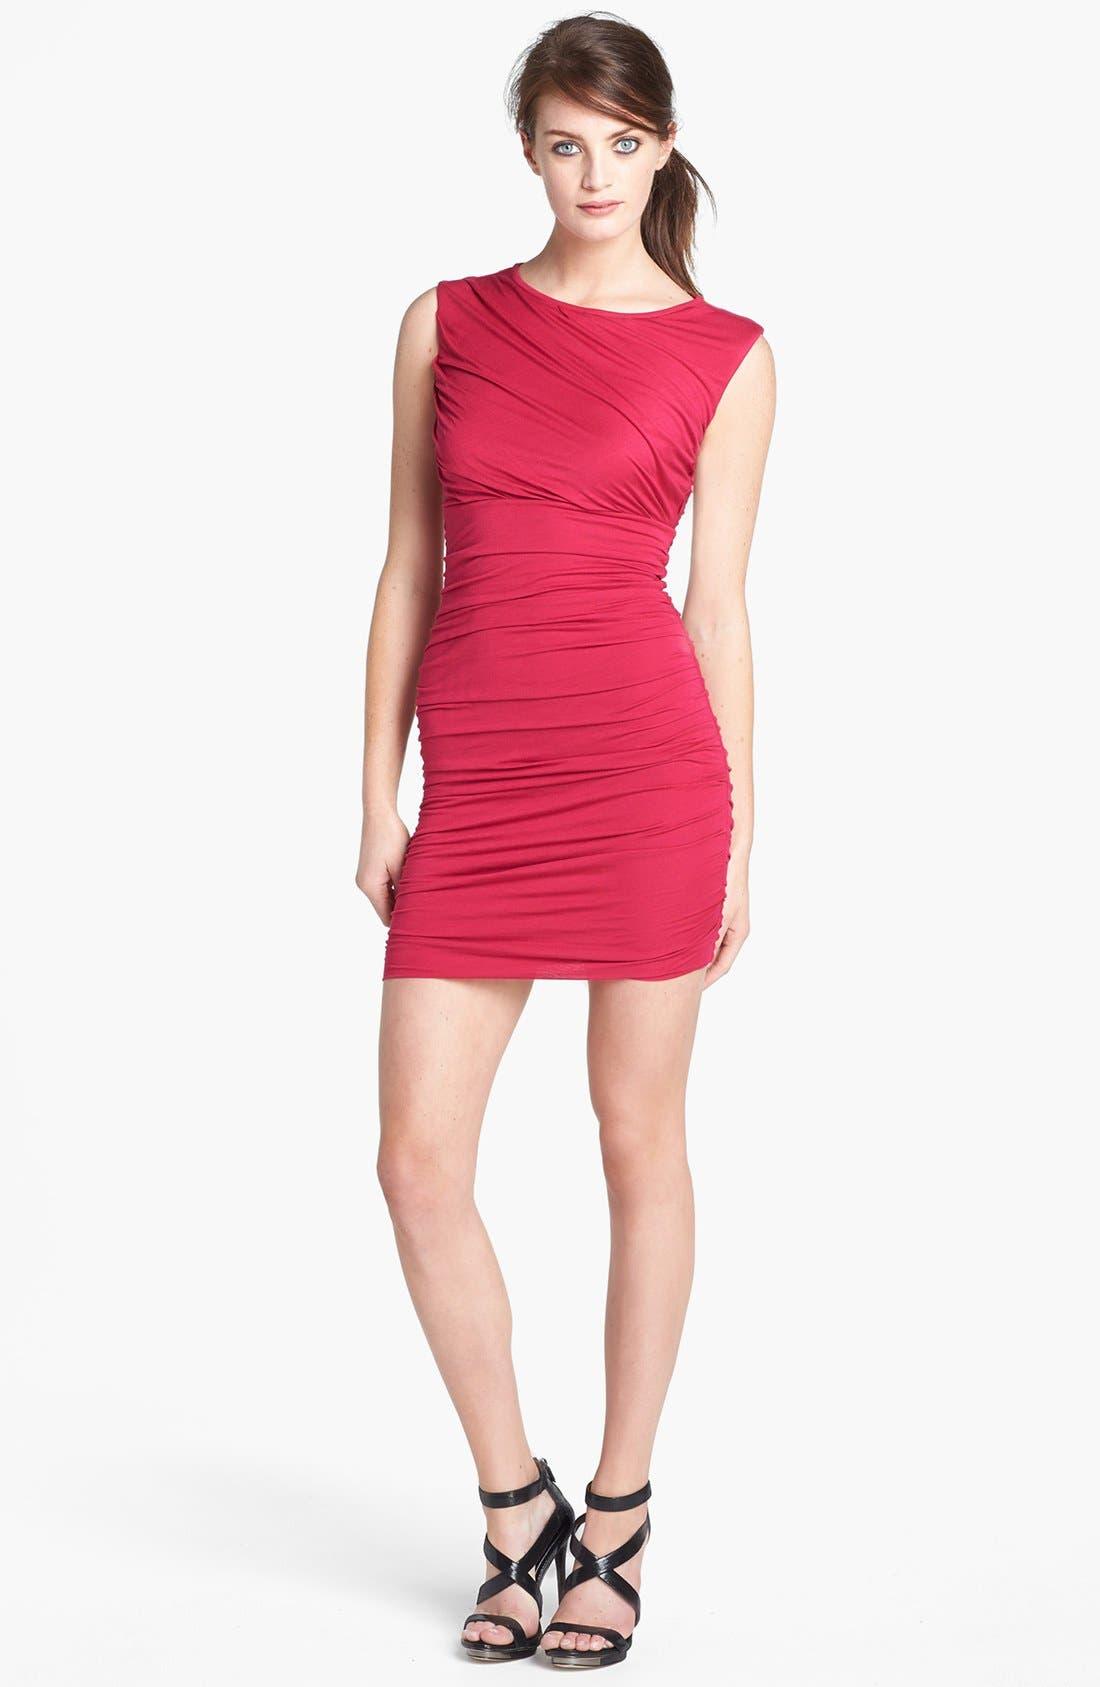 Alternate Image 1 Selected - Diane von Furstenberg 'Angelina' Ruched Knit Sleeveless Dress